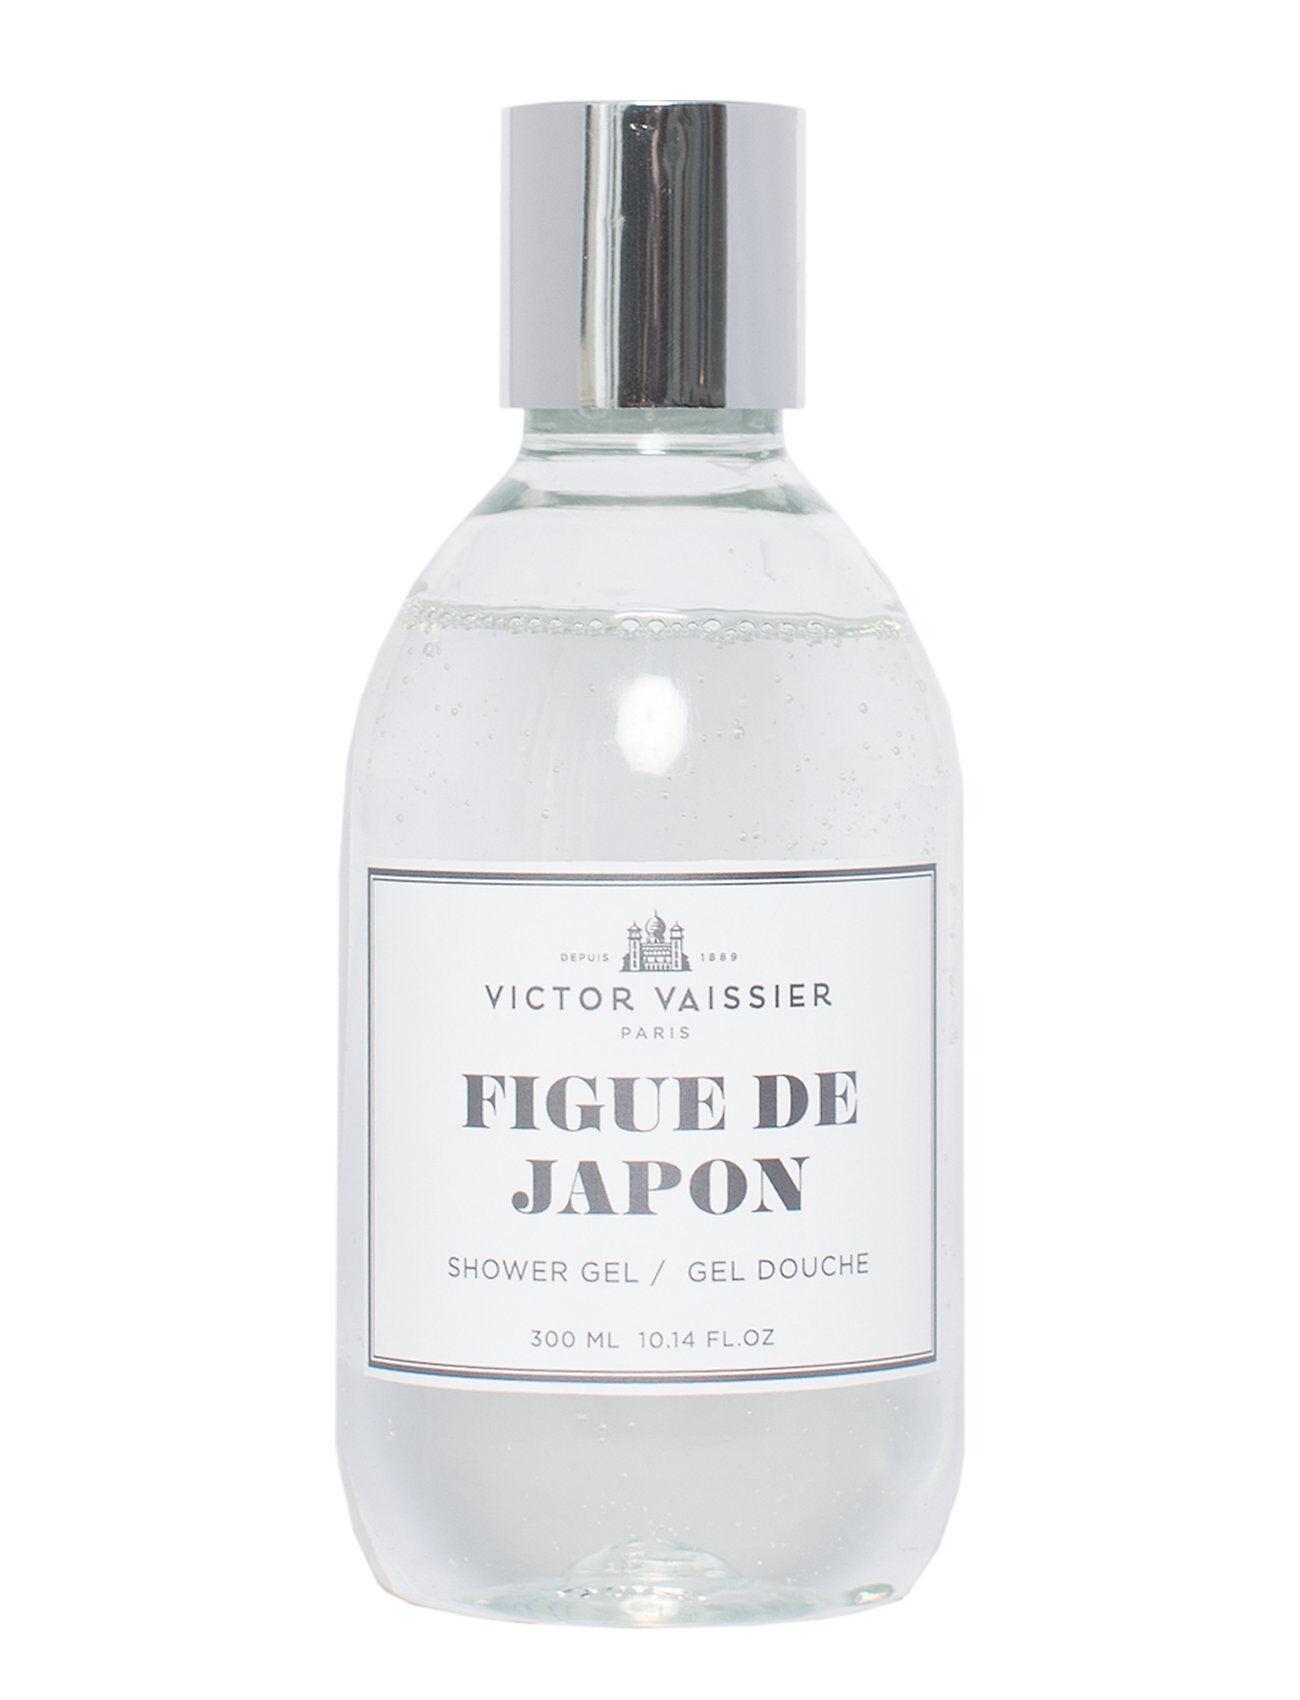 Victor Vaissier Shower Gel Figue Du Japon Beauty MEN Skin Care Body Shower Gel Nude Victor Vaissier